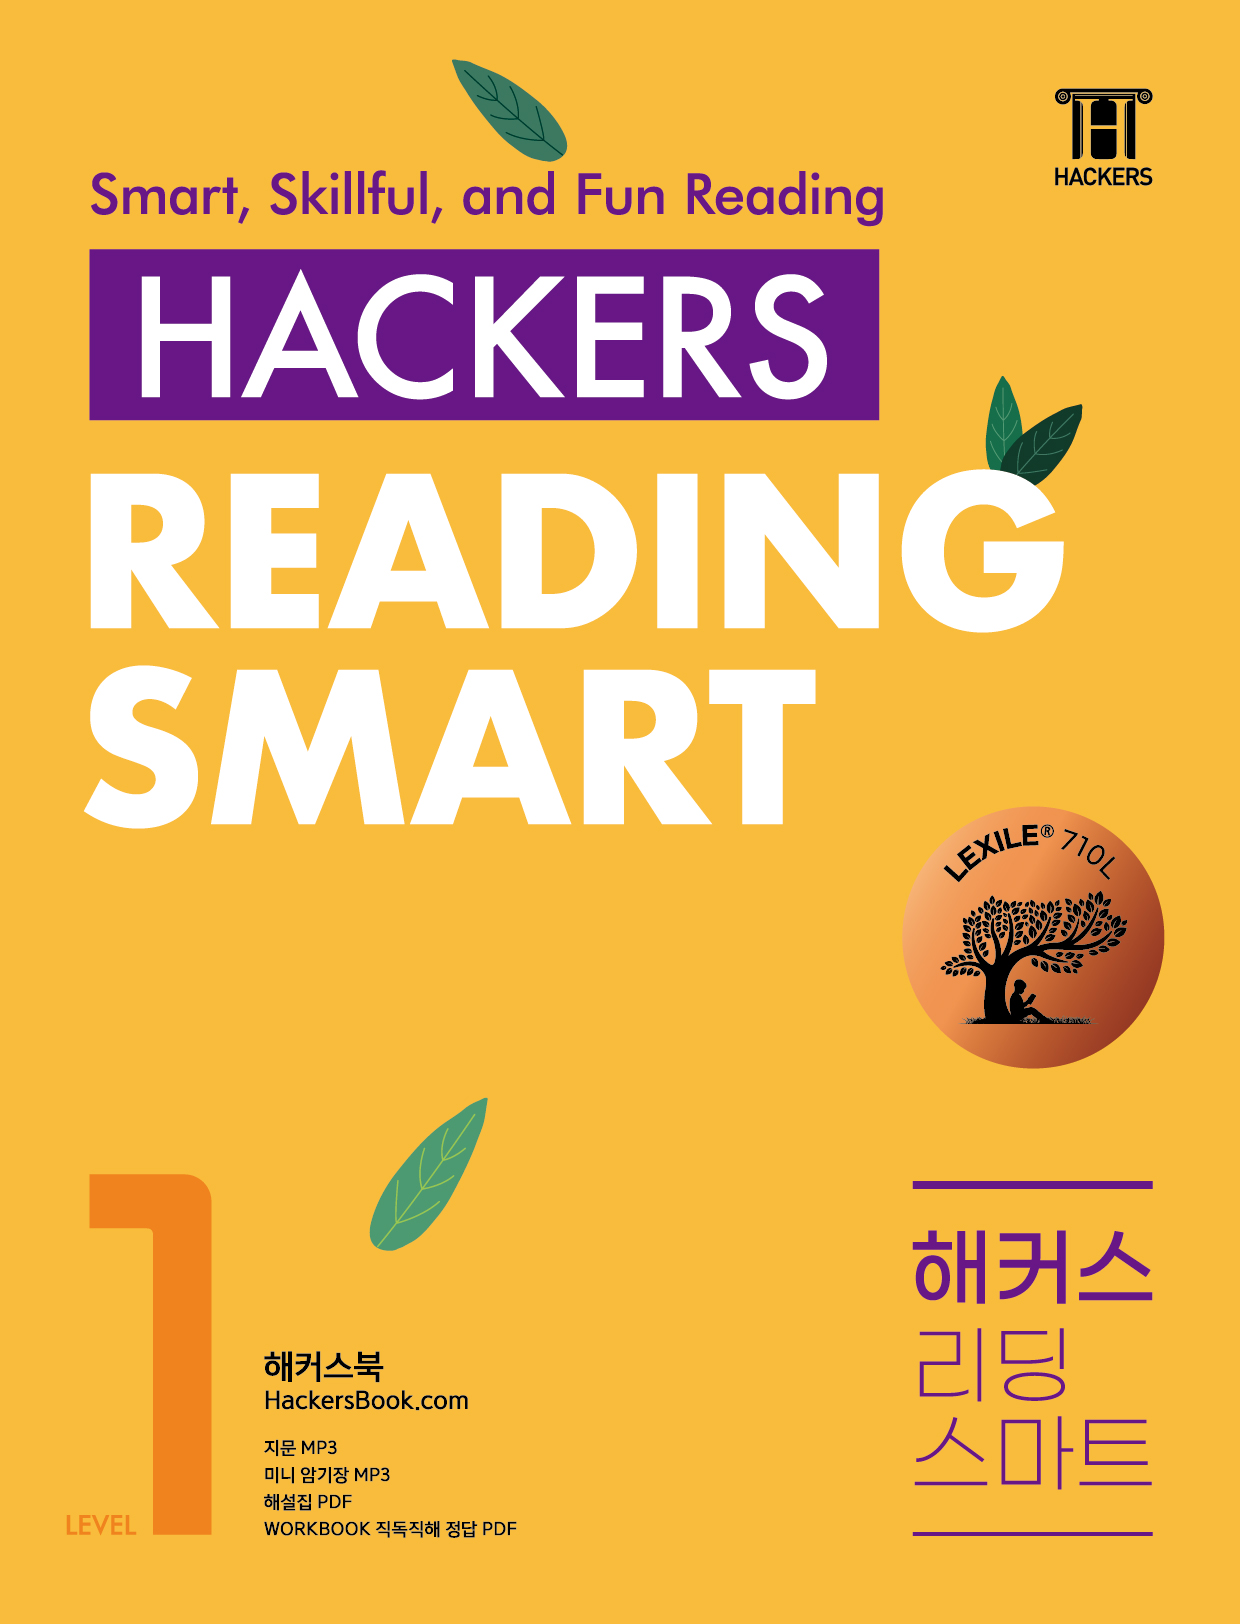 Hackers Reading Smart Level 1